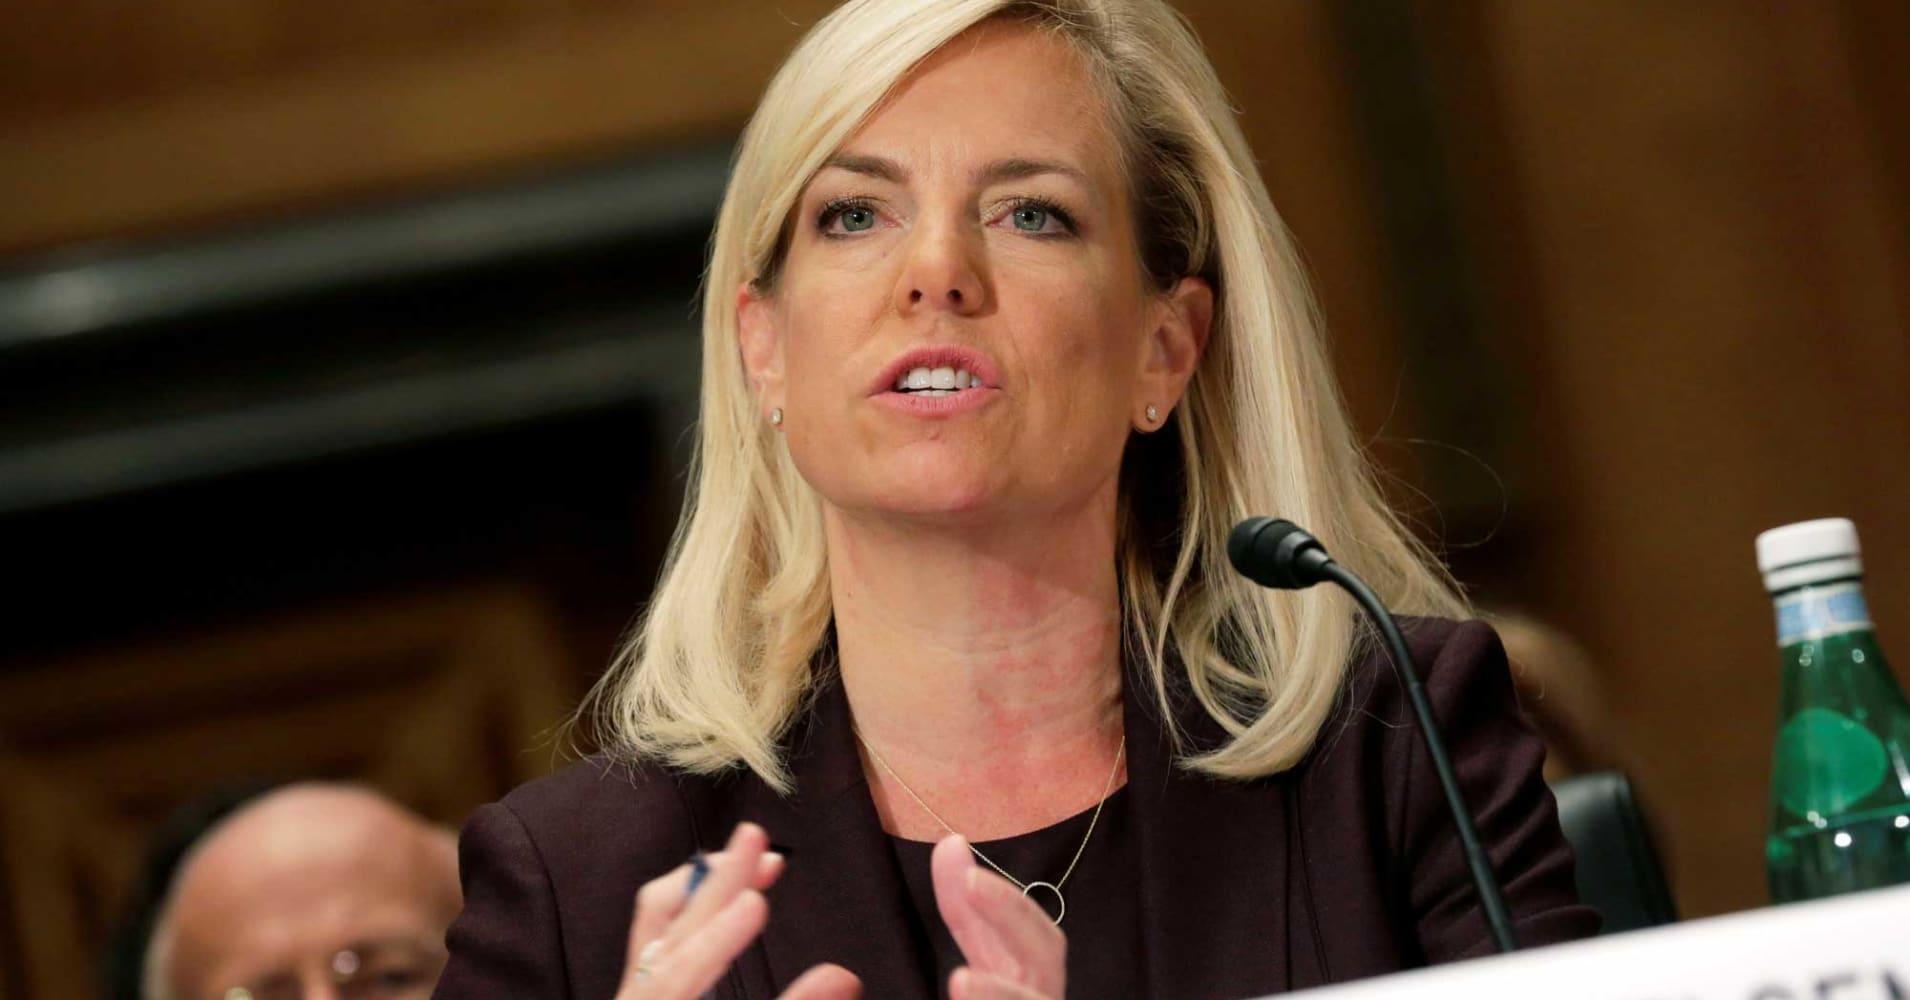 DHS secretary Nielsen says she doesn't recall Trump vulgarity